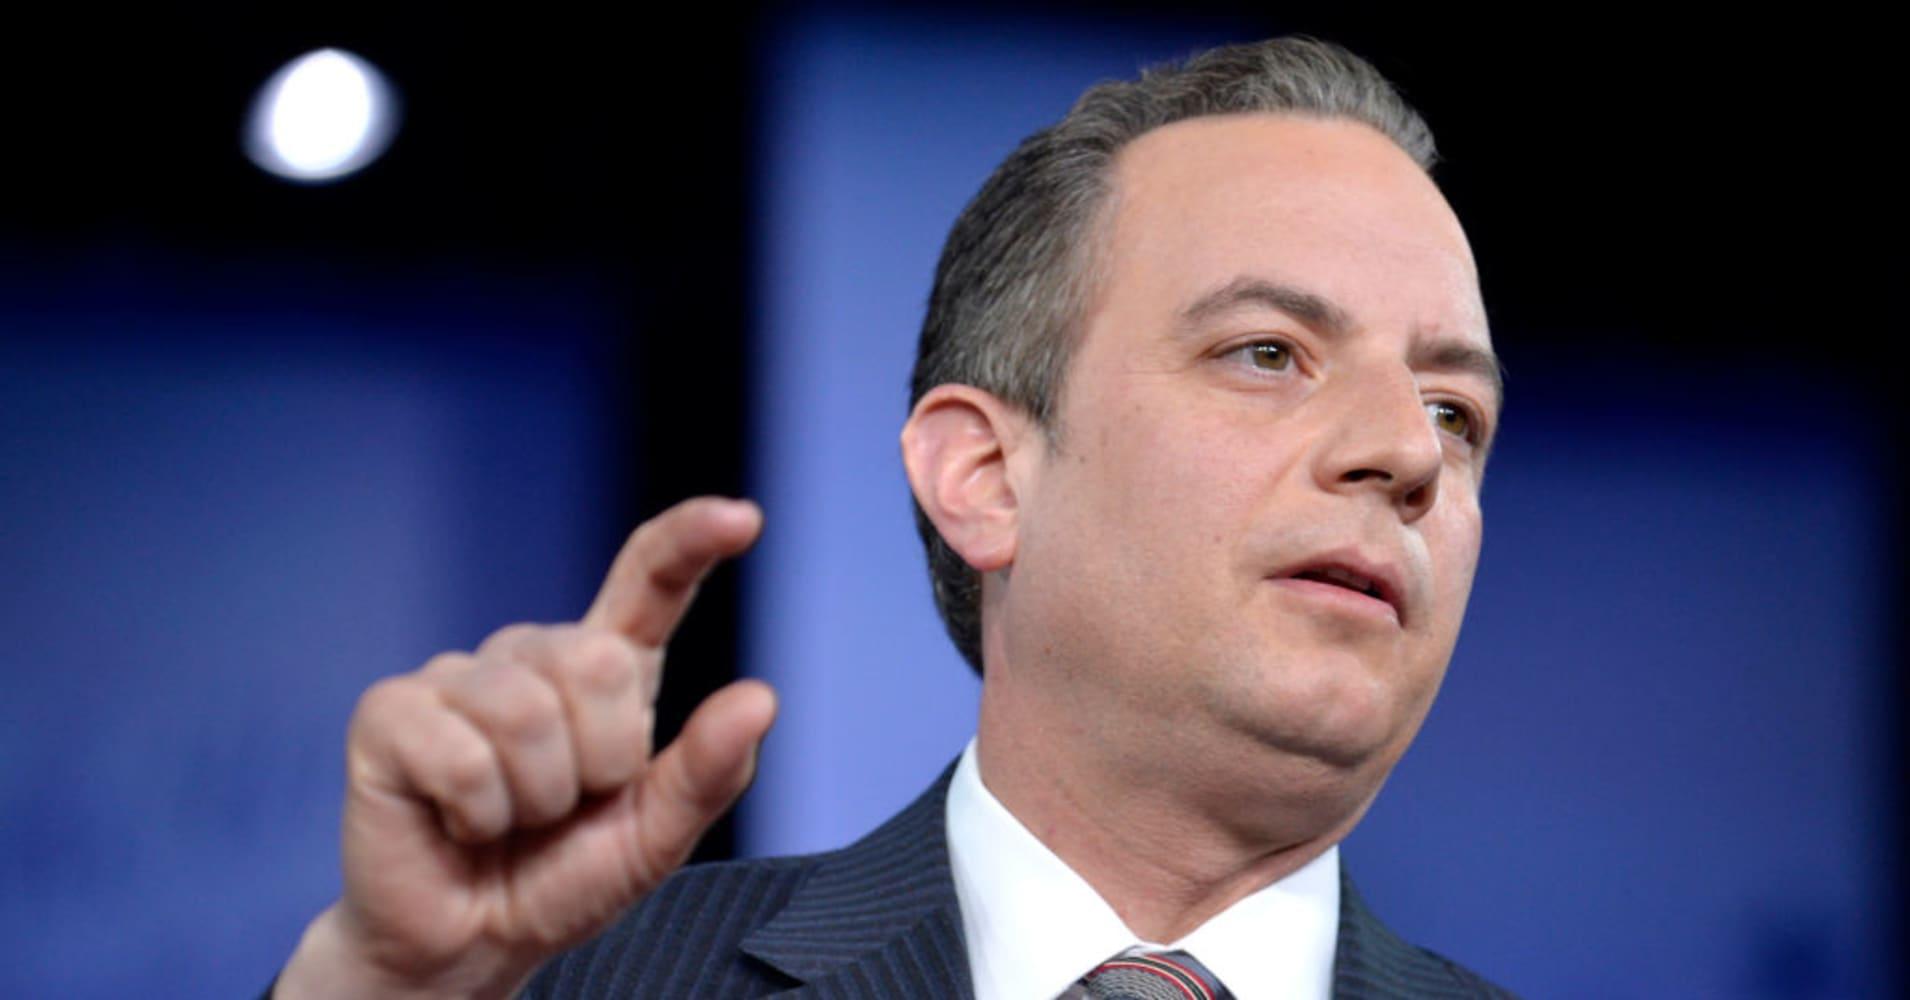 politics donald trump after pledging donate salary declines release proof